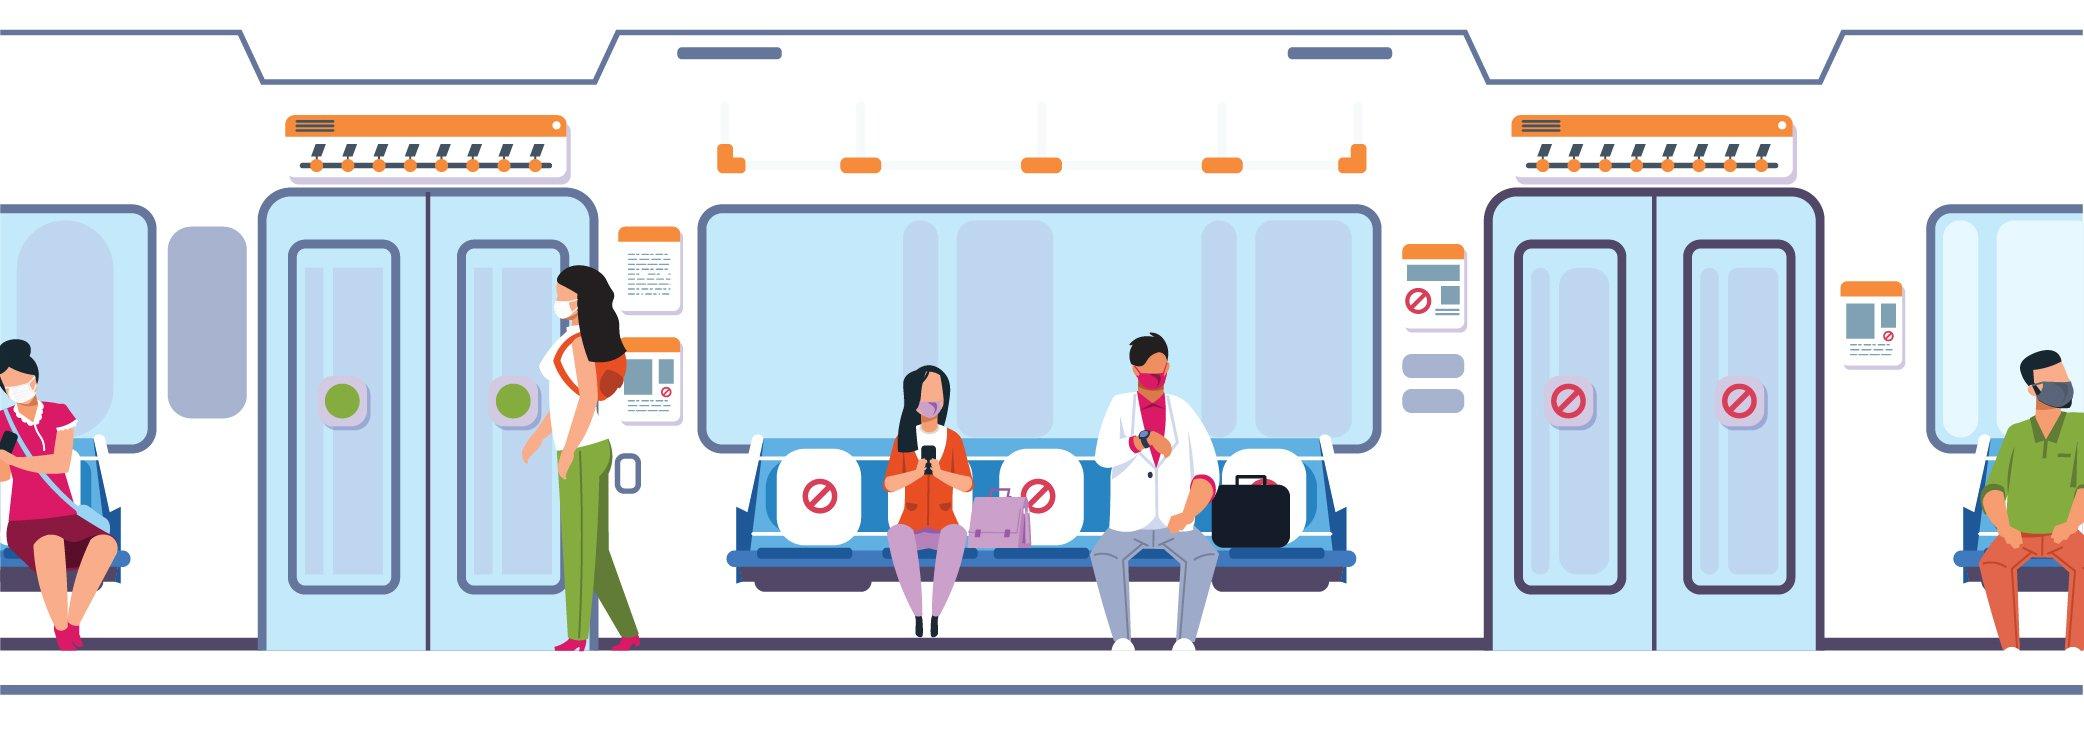 Illustration - People on city bus